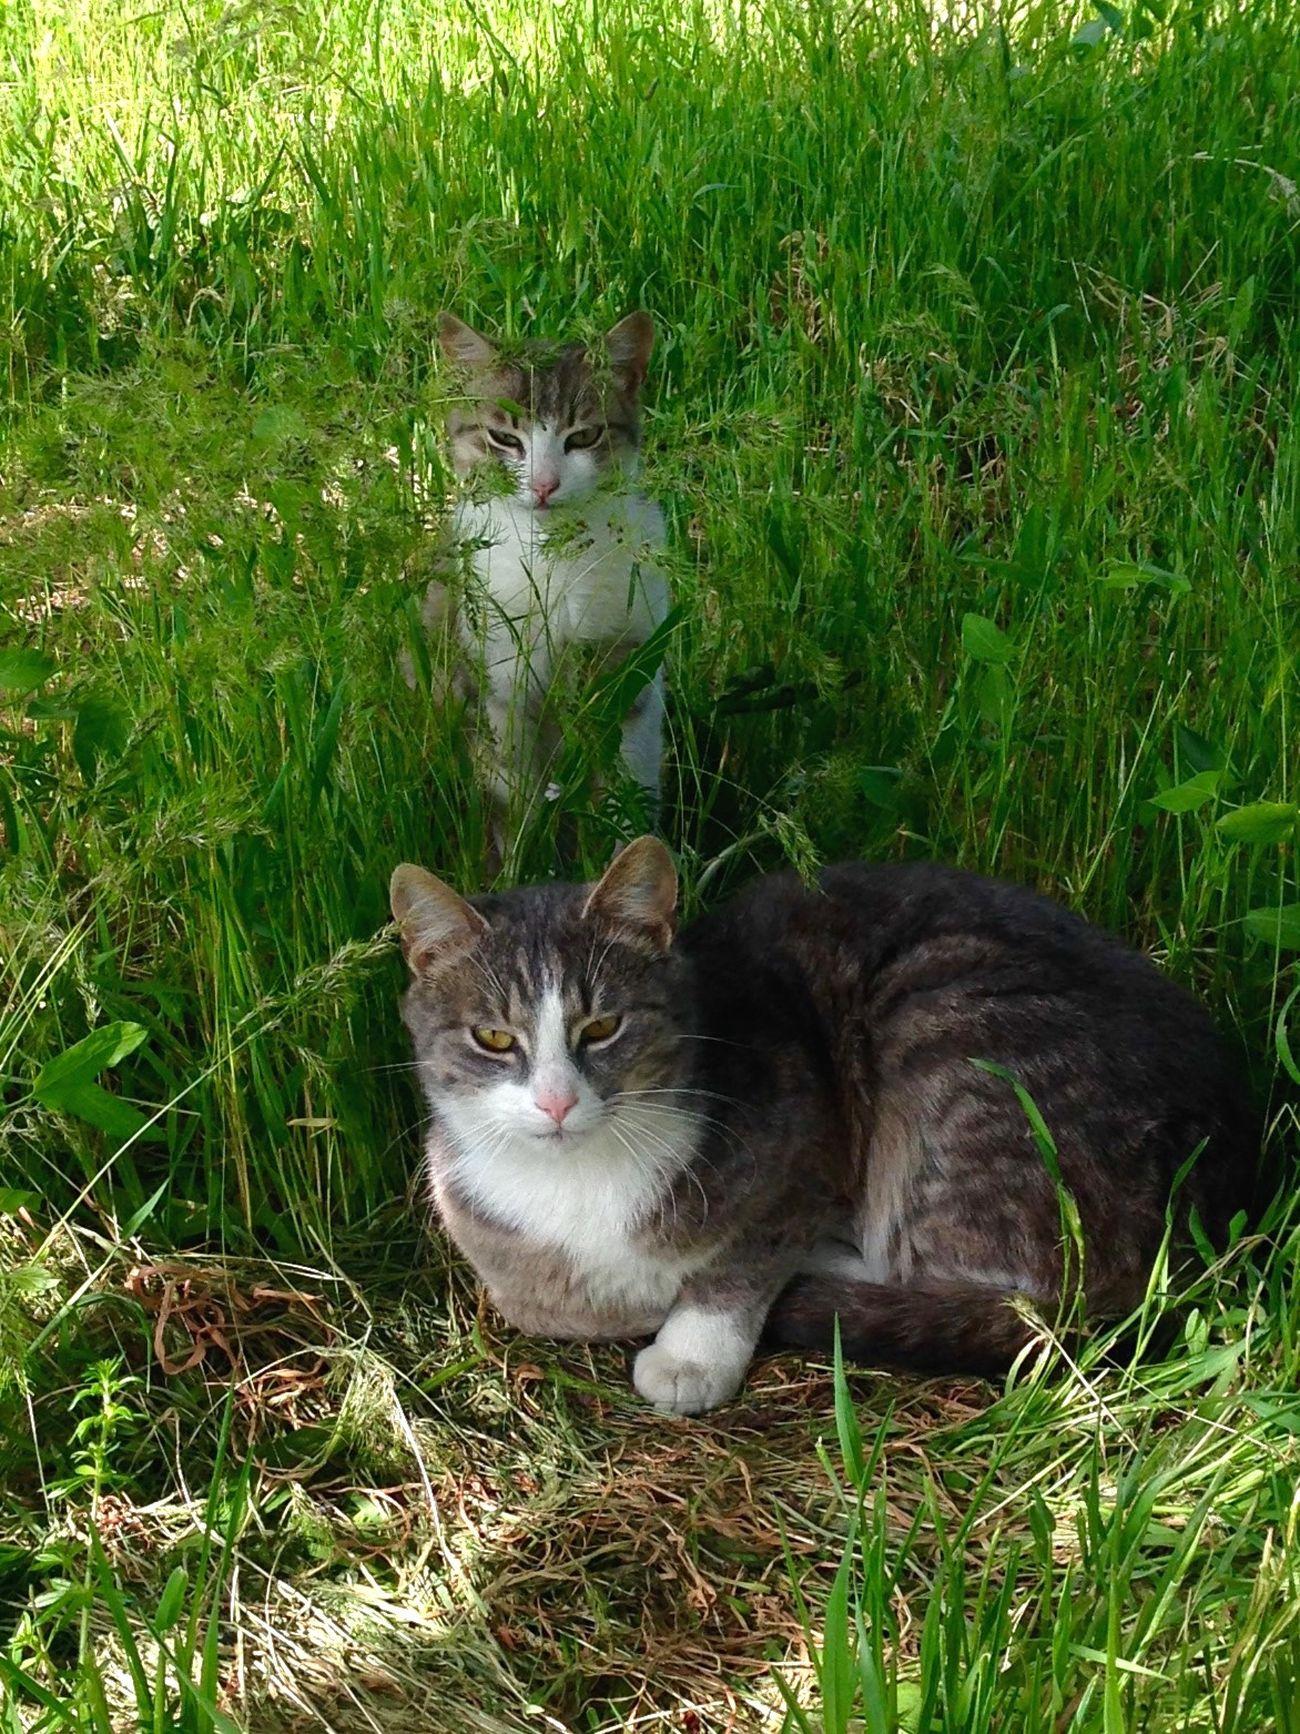 Cats 🐱 Cats Of EyeEm Cat♡ Cat Cat Lovers Cats Homeless Cats Котик Коты котэ кот